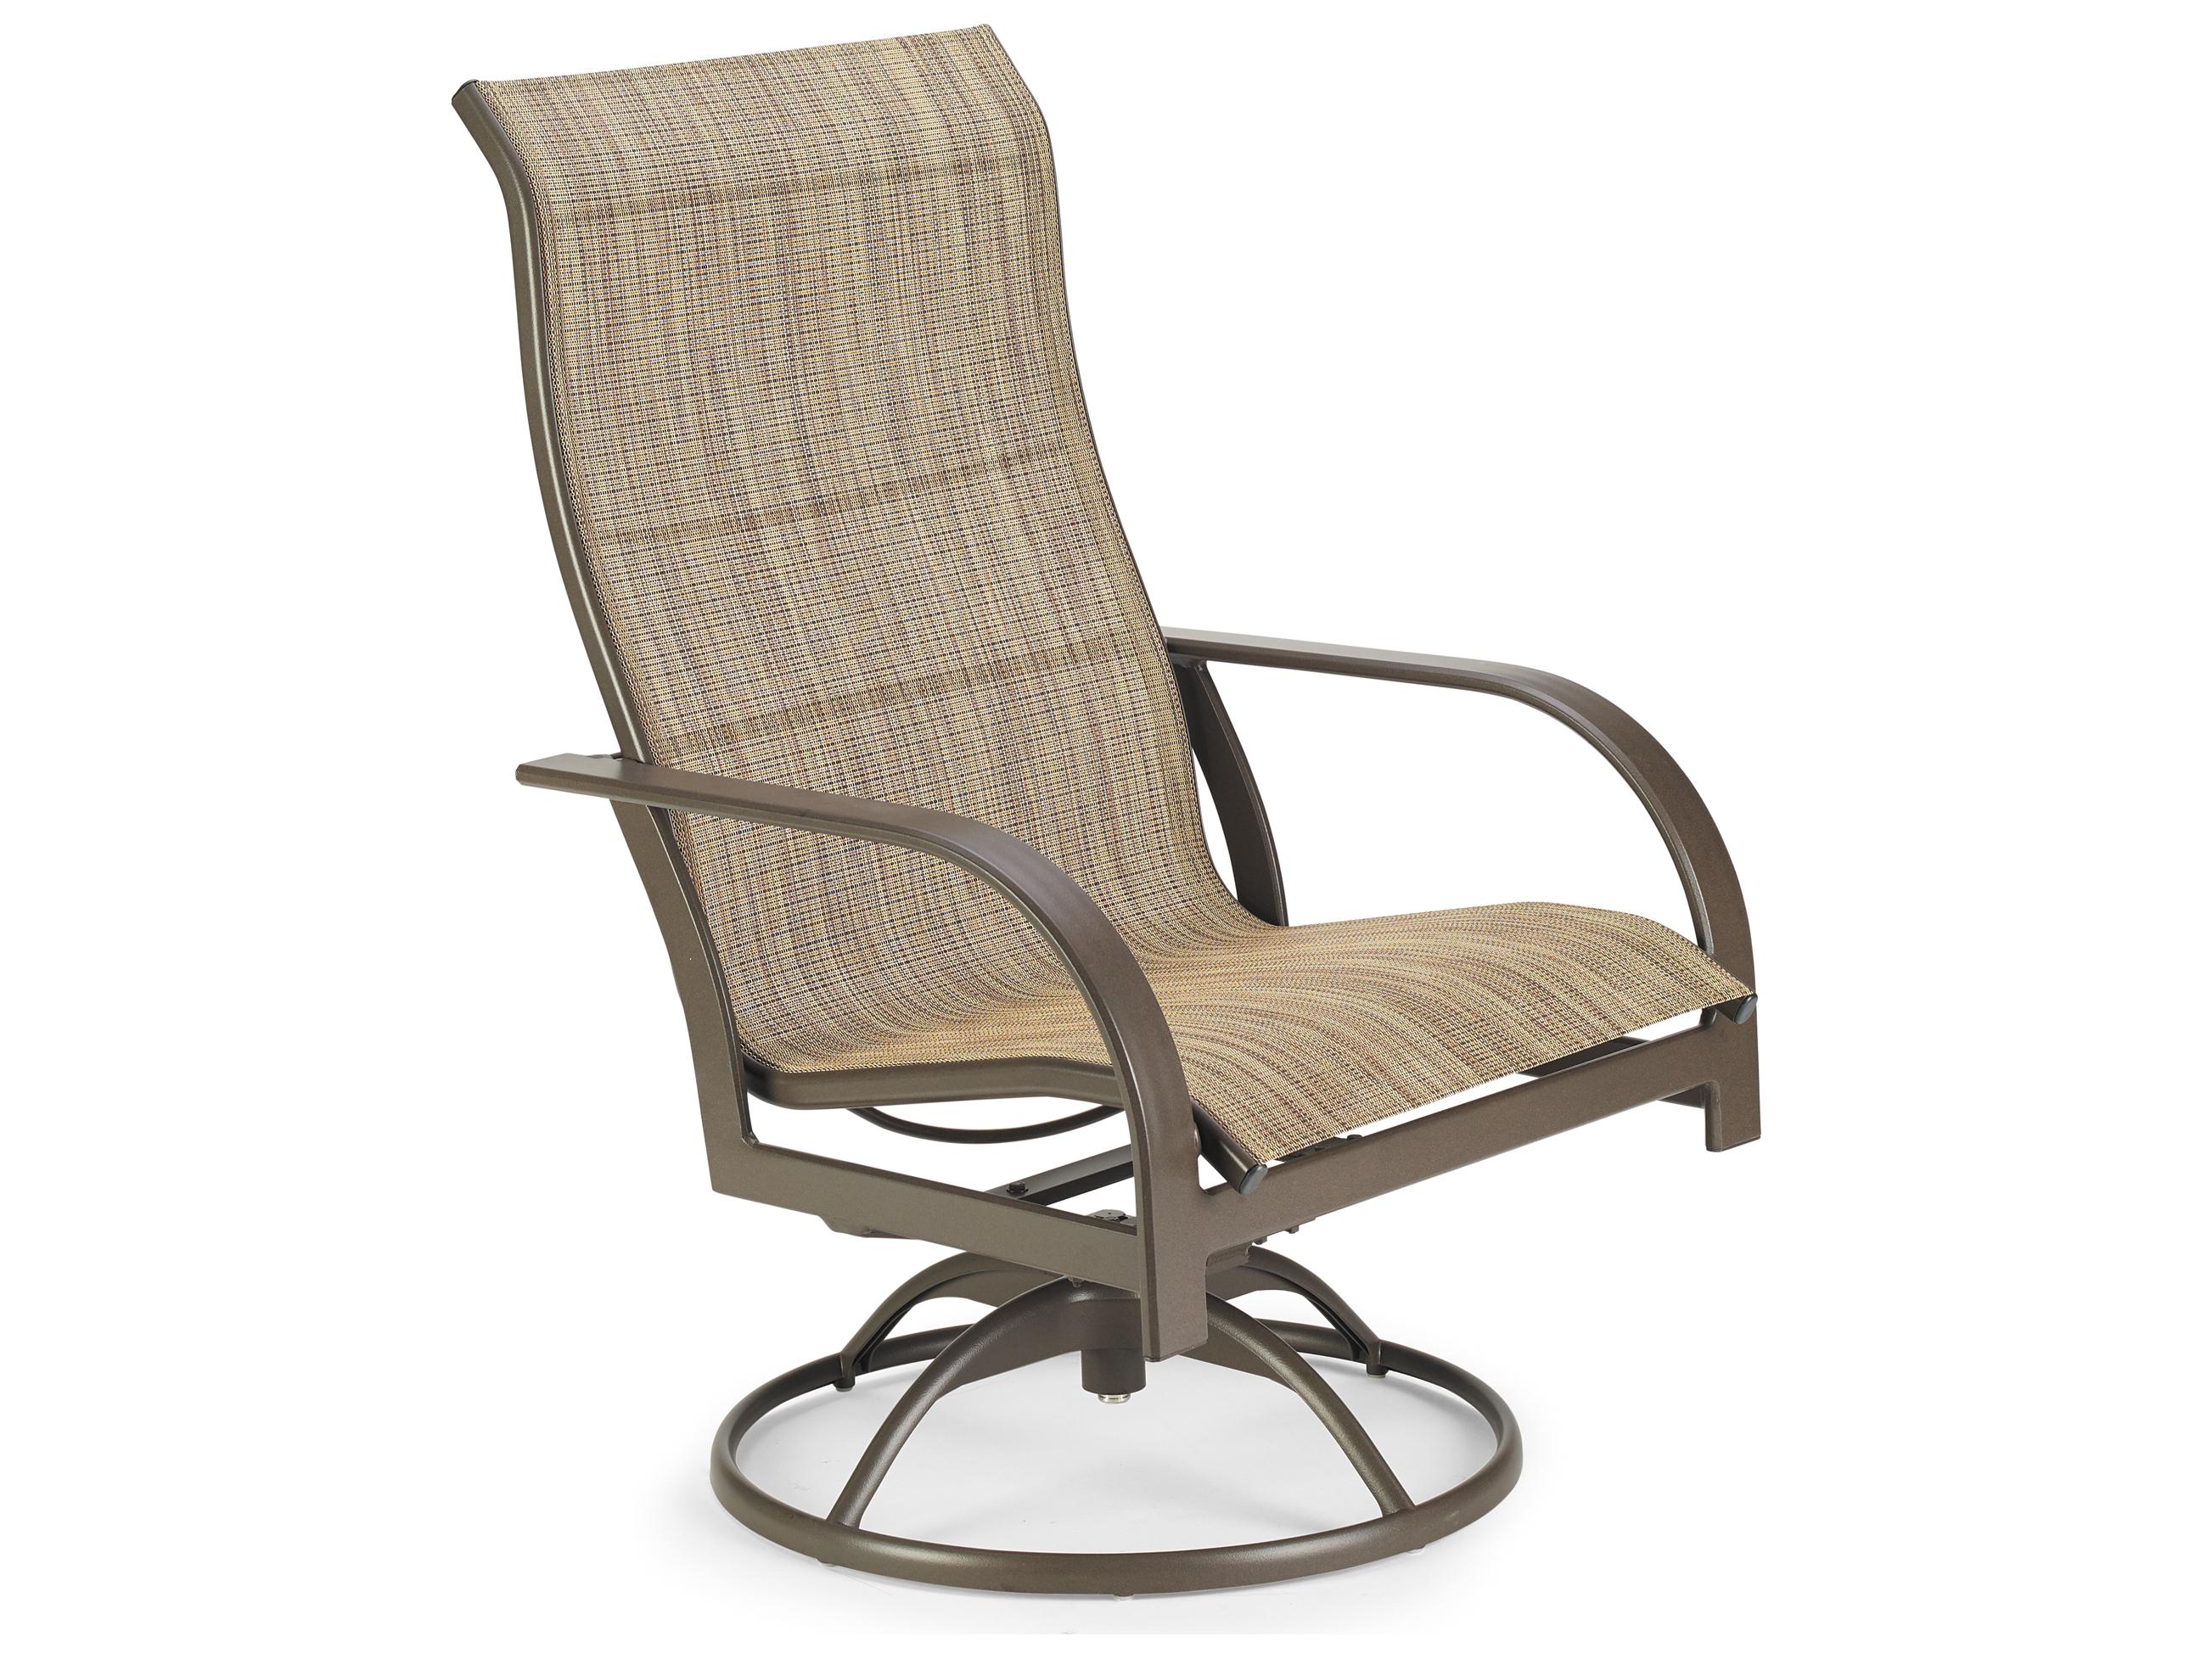 key west chairs ferrari scuderia office chair winston quick ship sling aluminum swivel tilt